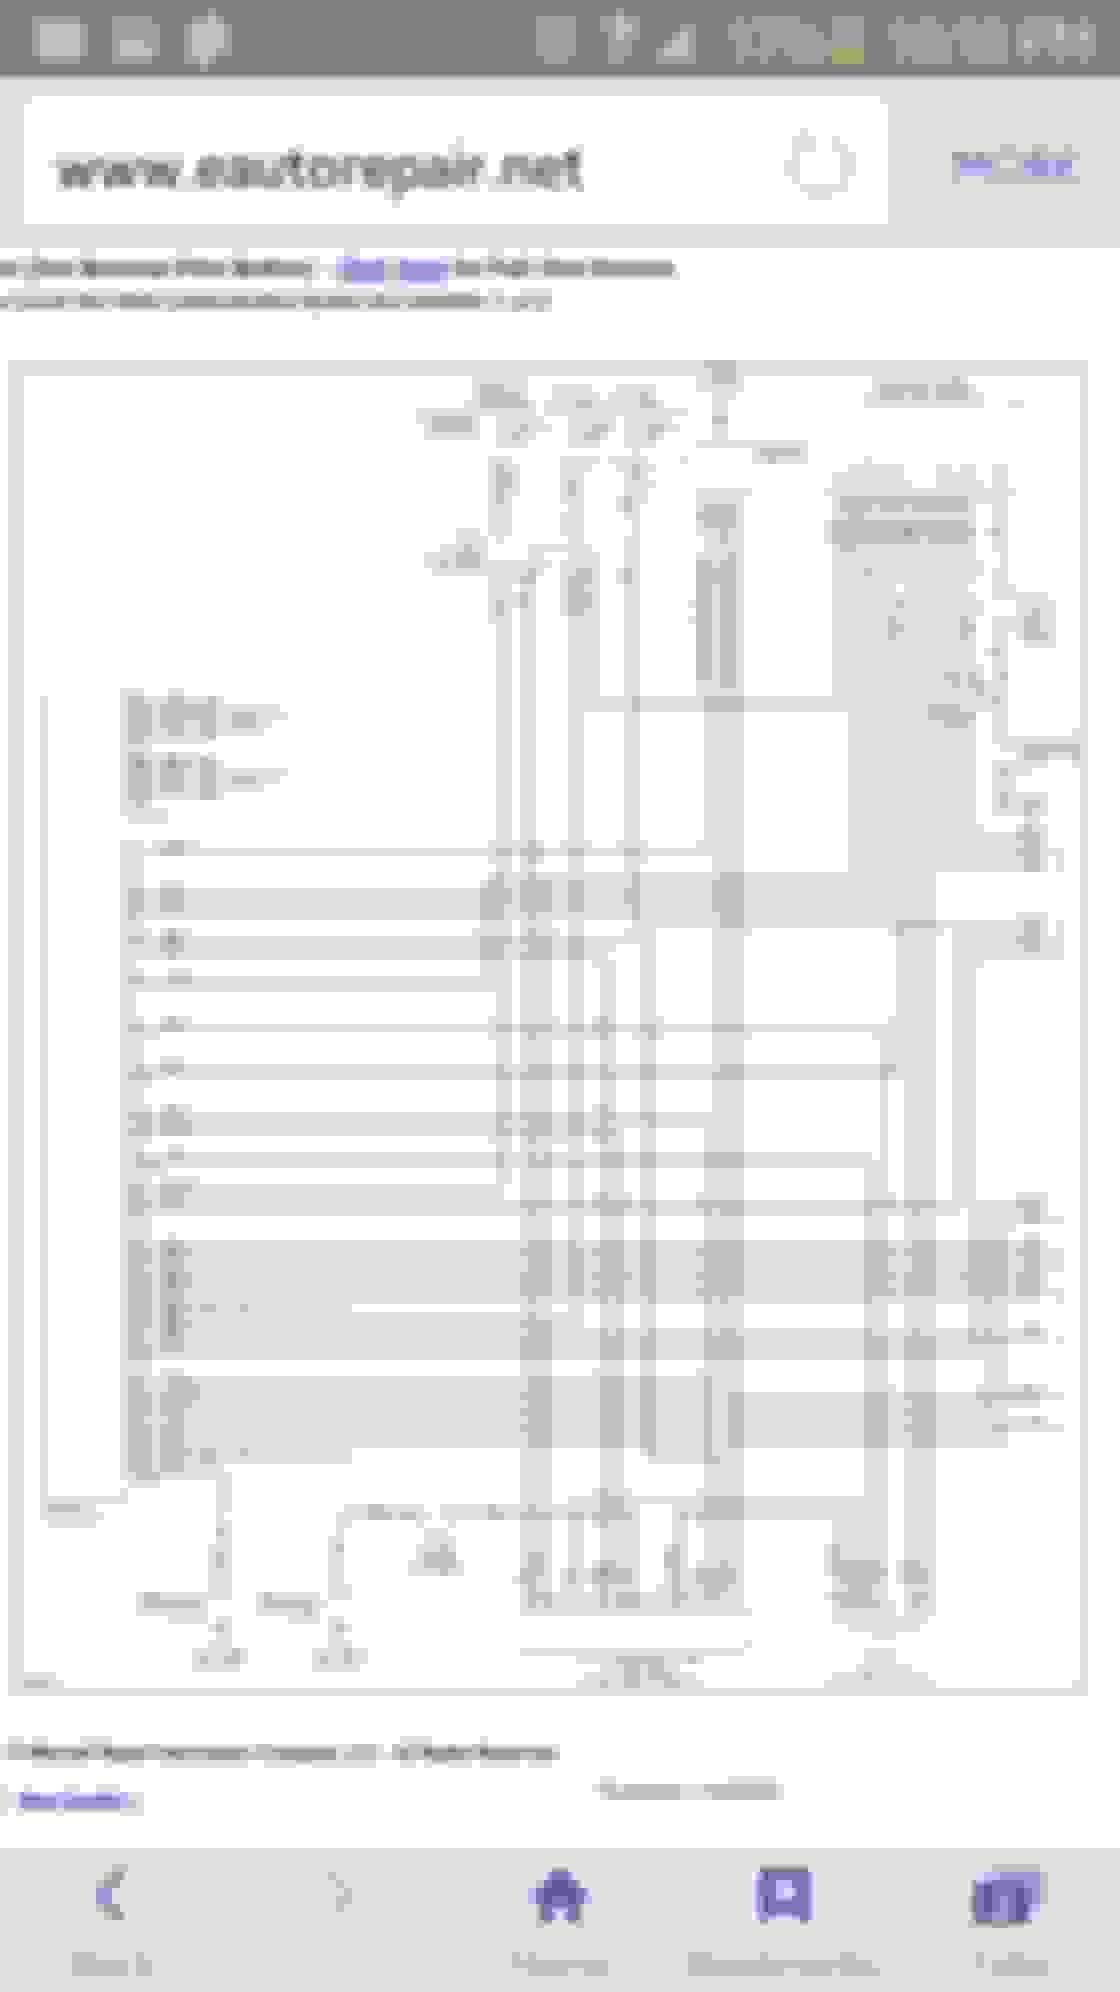 mitsubishi asx wiring diagram - ace caravan wiring diagram -  cts-lsa.2005vtx.jeanjaures37.fr  wiring diagram resource